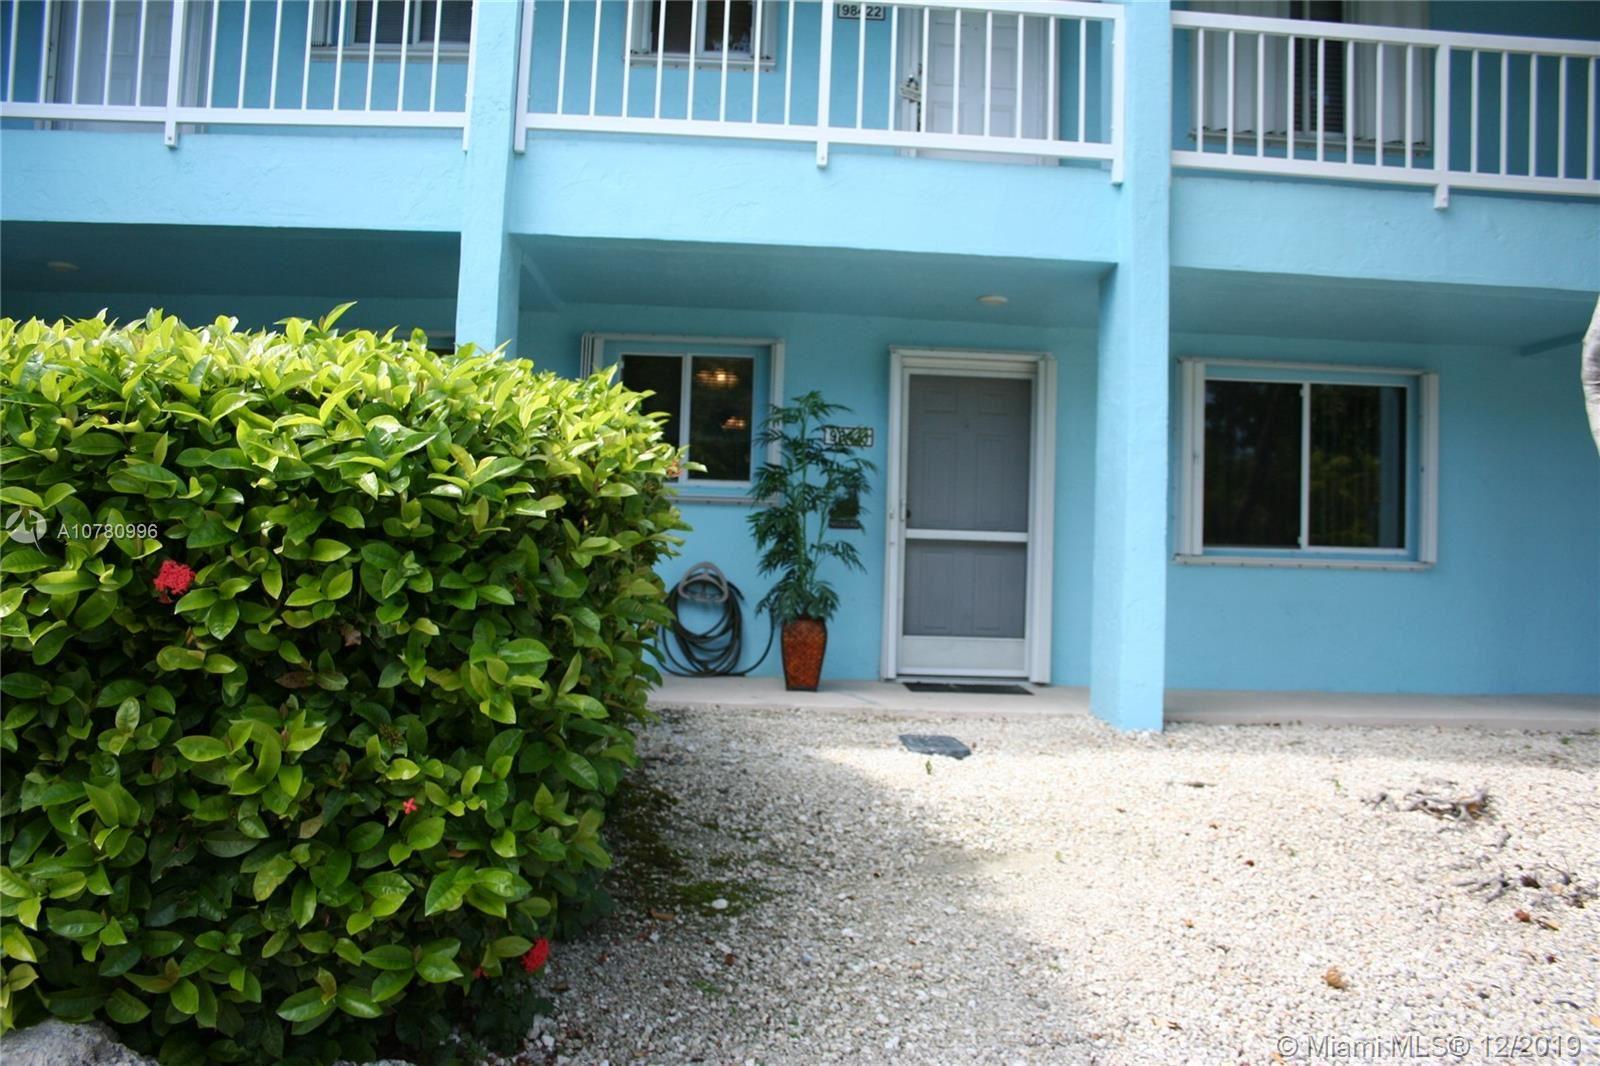 98421 Windward Avenue, Key Largo, FL 33037 - #: A10780996